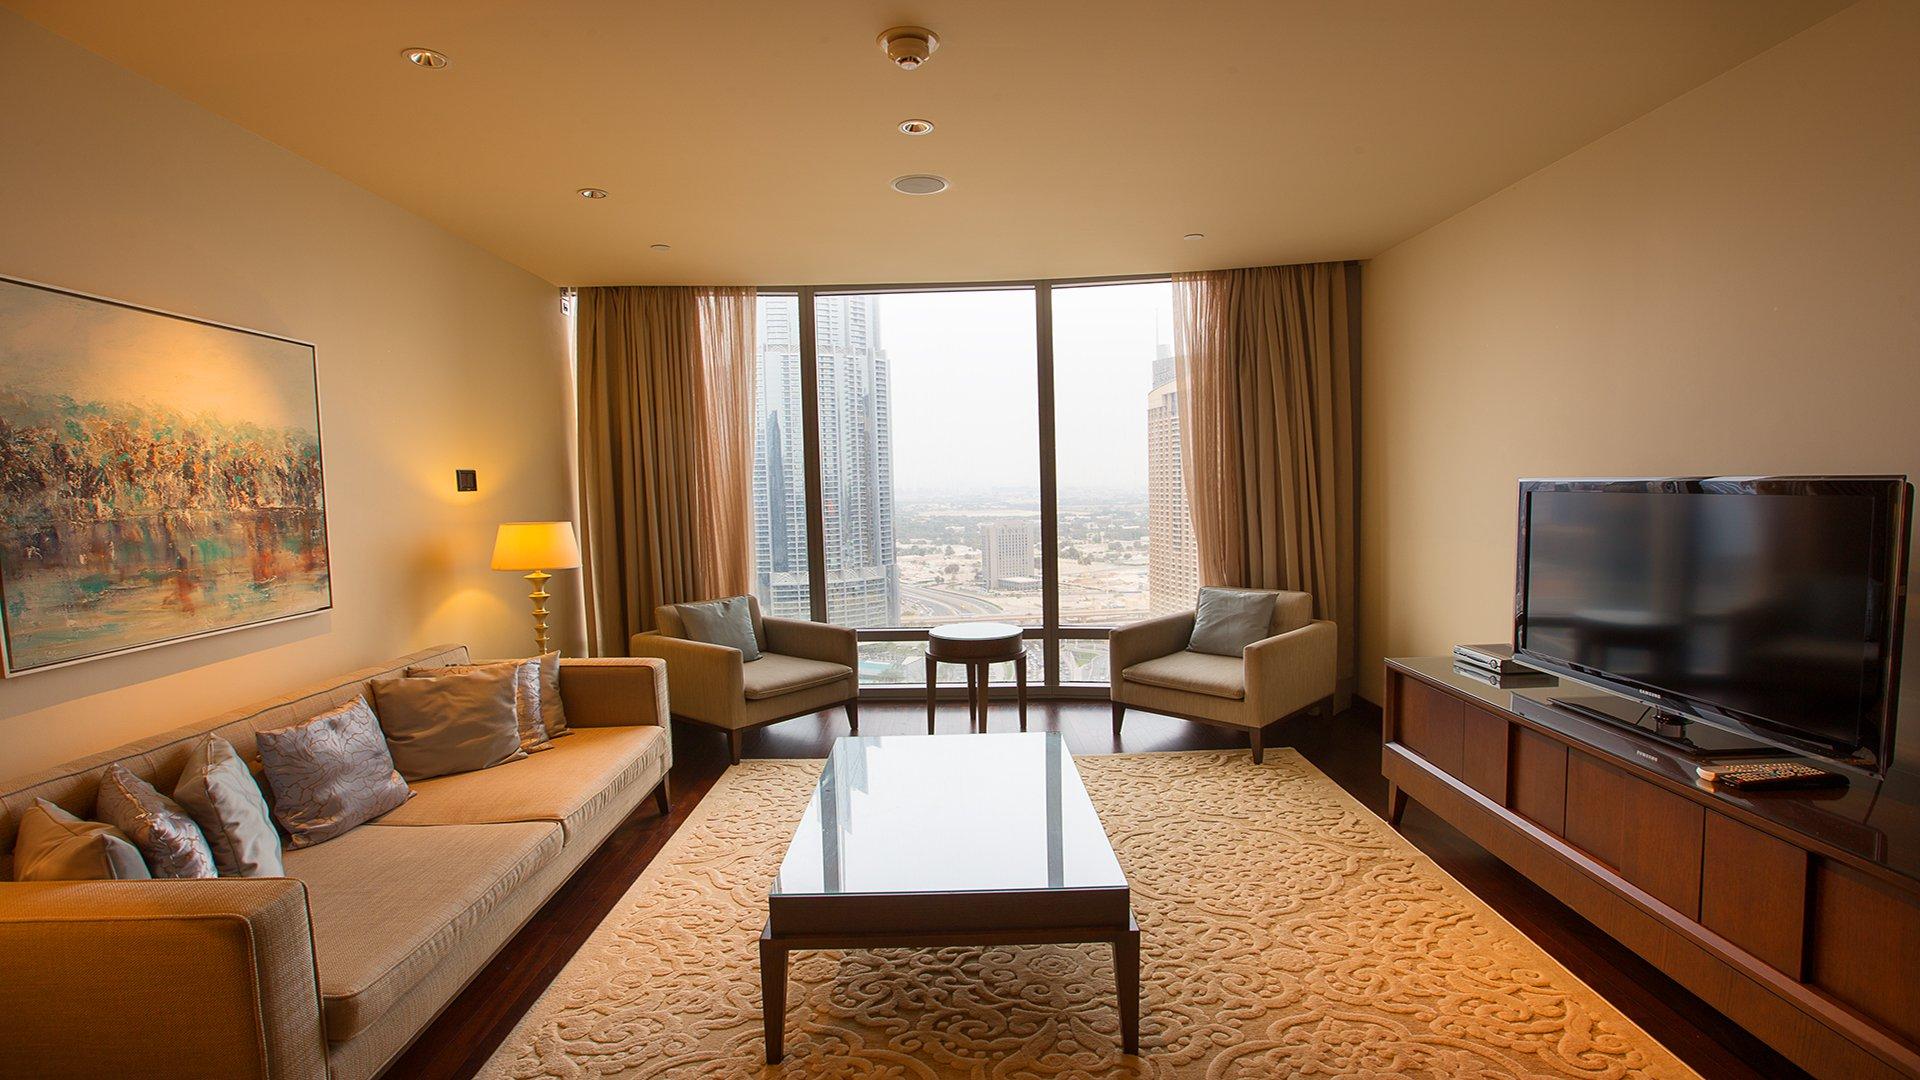 Ad Sale Apartment Downtown Dubai Burj Khalifa ref:V0342DU